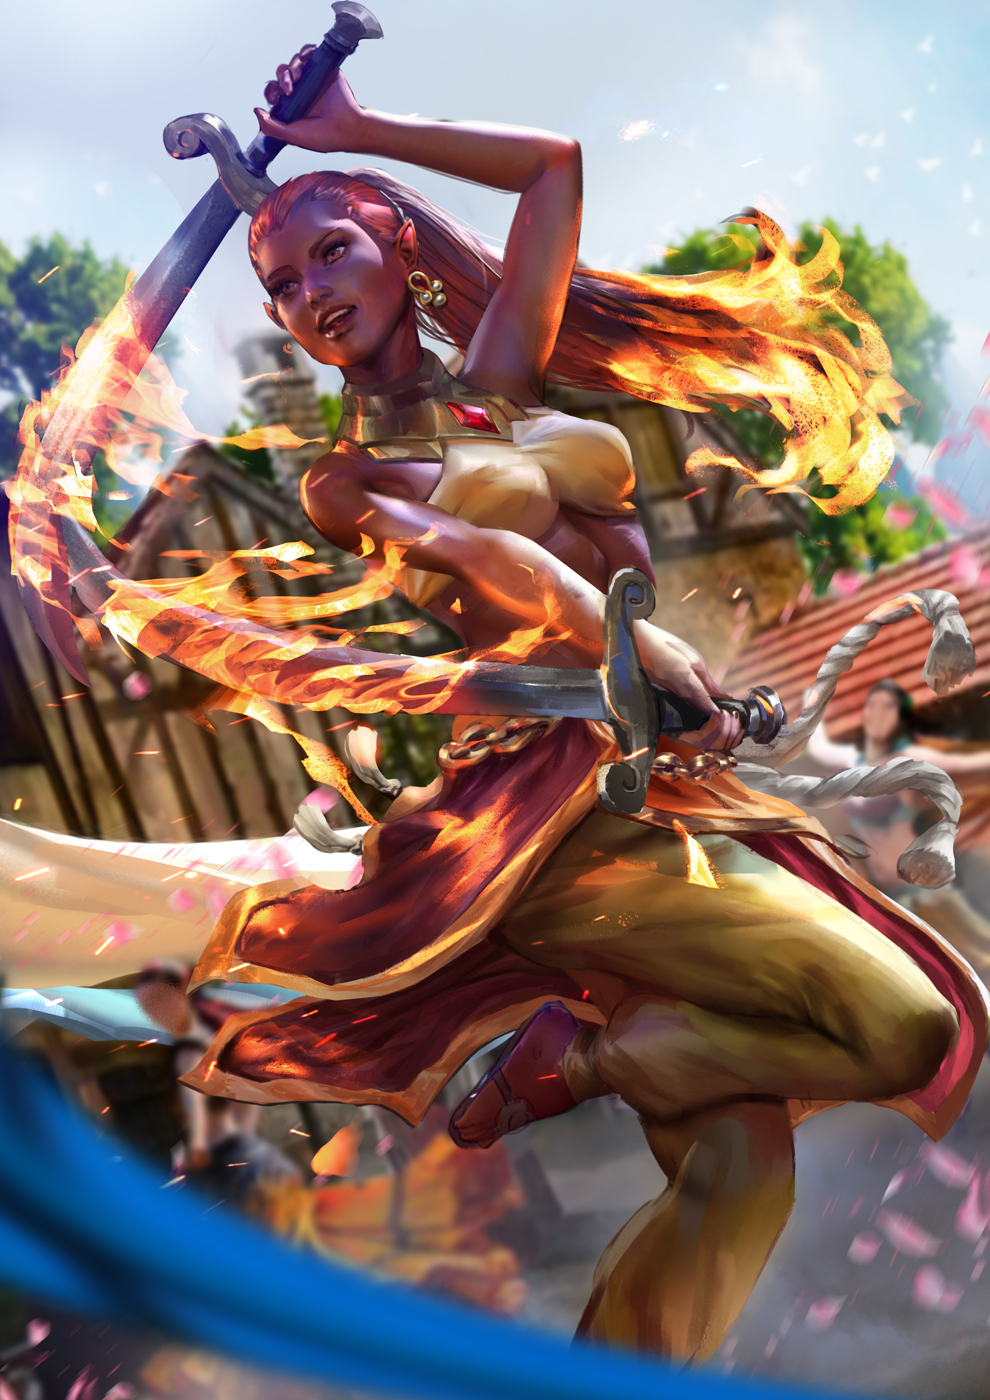 Elidi Fire Dancer